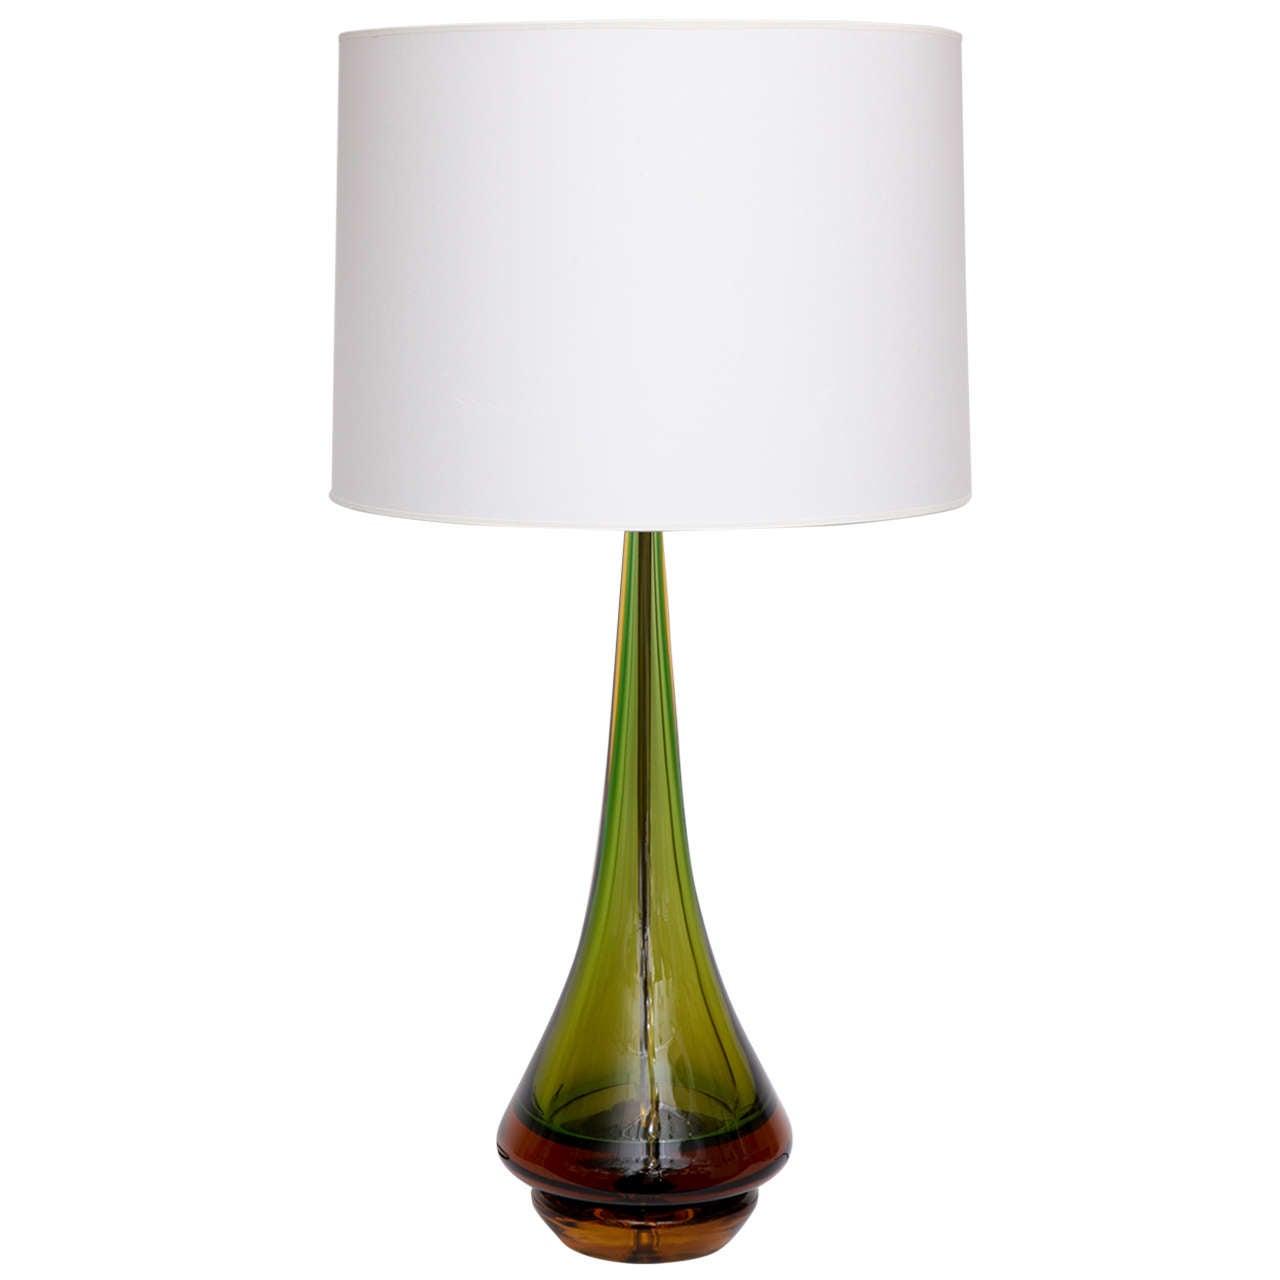 1950s Italian Art Glass Table Lamp Signed Seguso